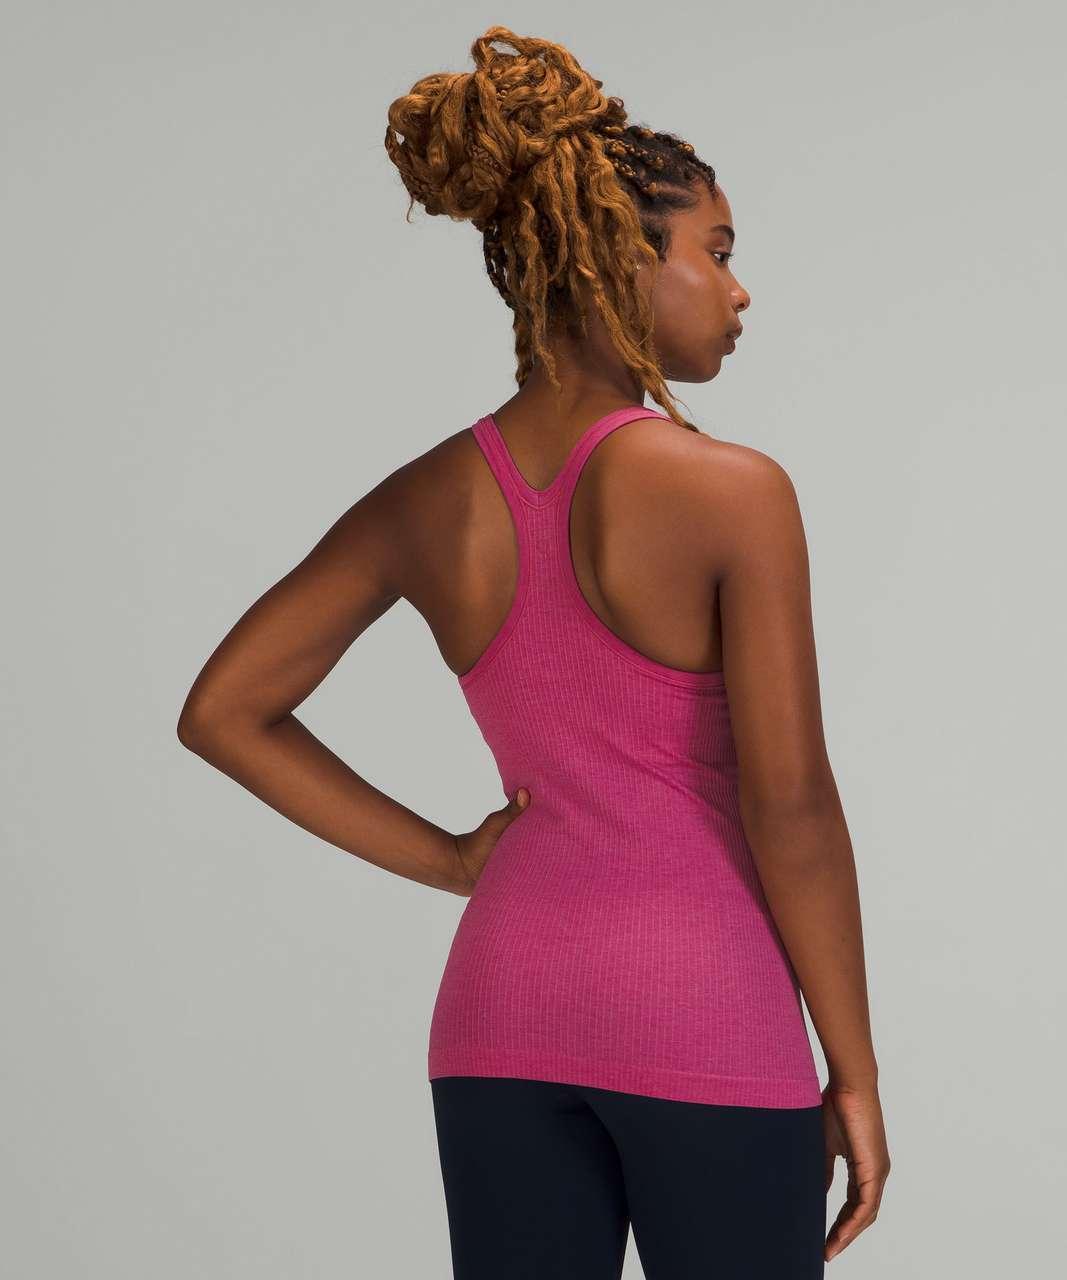 Lululemon Ebb to Street Shelf Bra Tank Top *Light Support - Pink Lychee